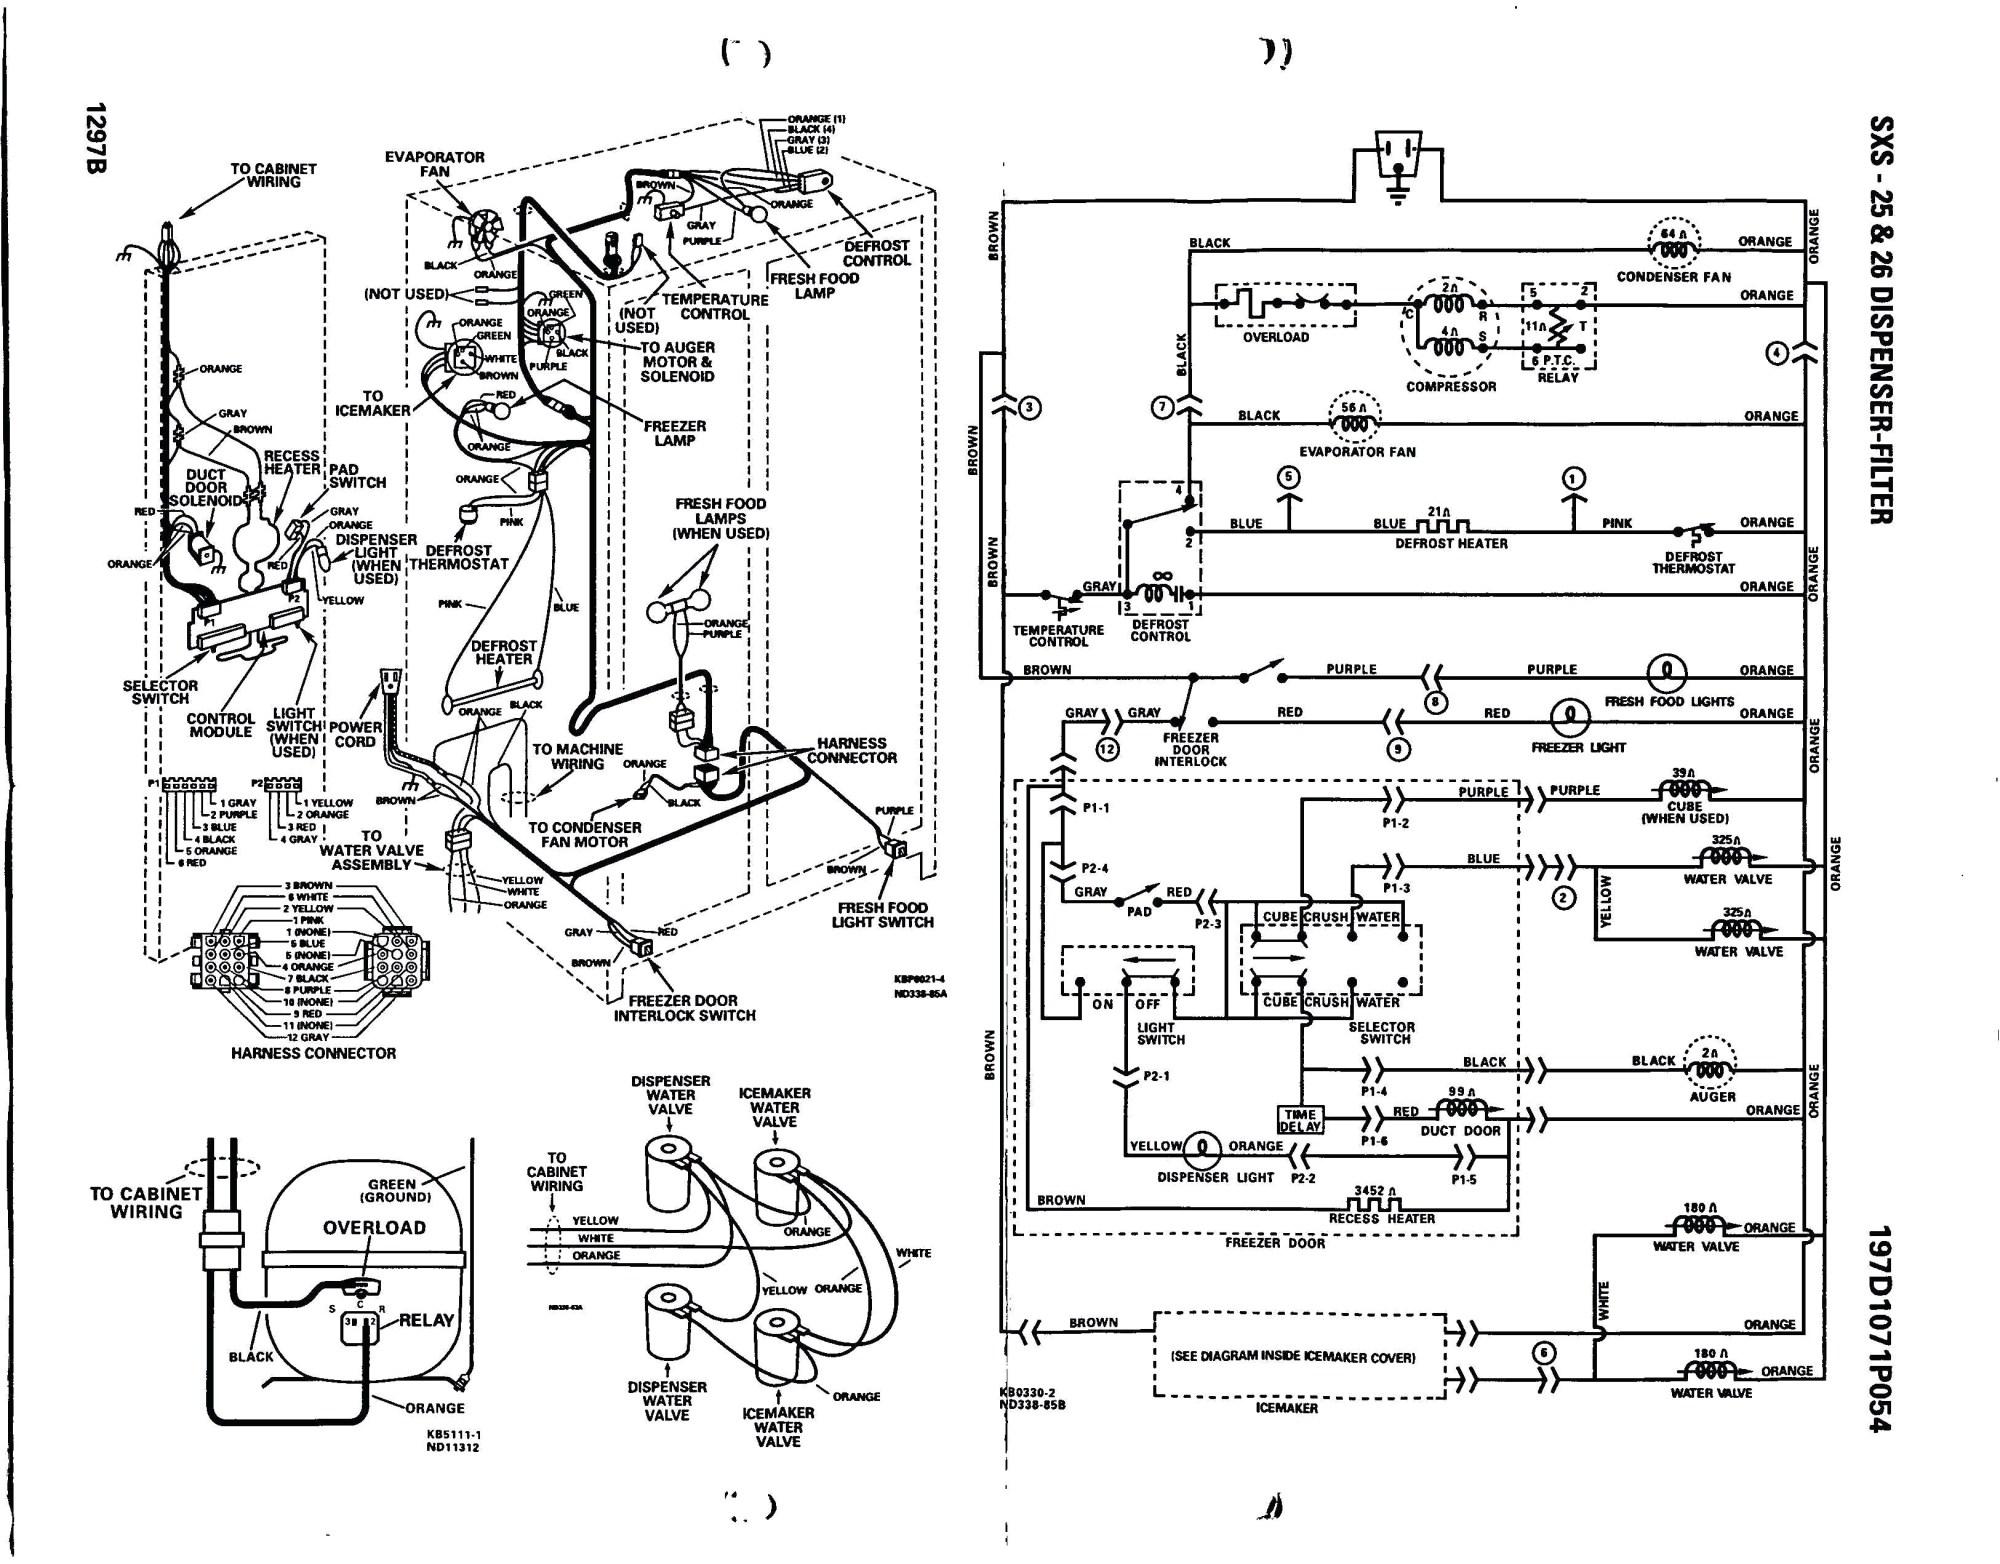 hight resolution of single phase marathon motor wiring diagram free wiring diagramsingle phase marathon motor wiring diagram hp electric